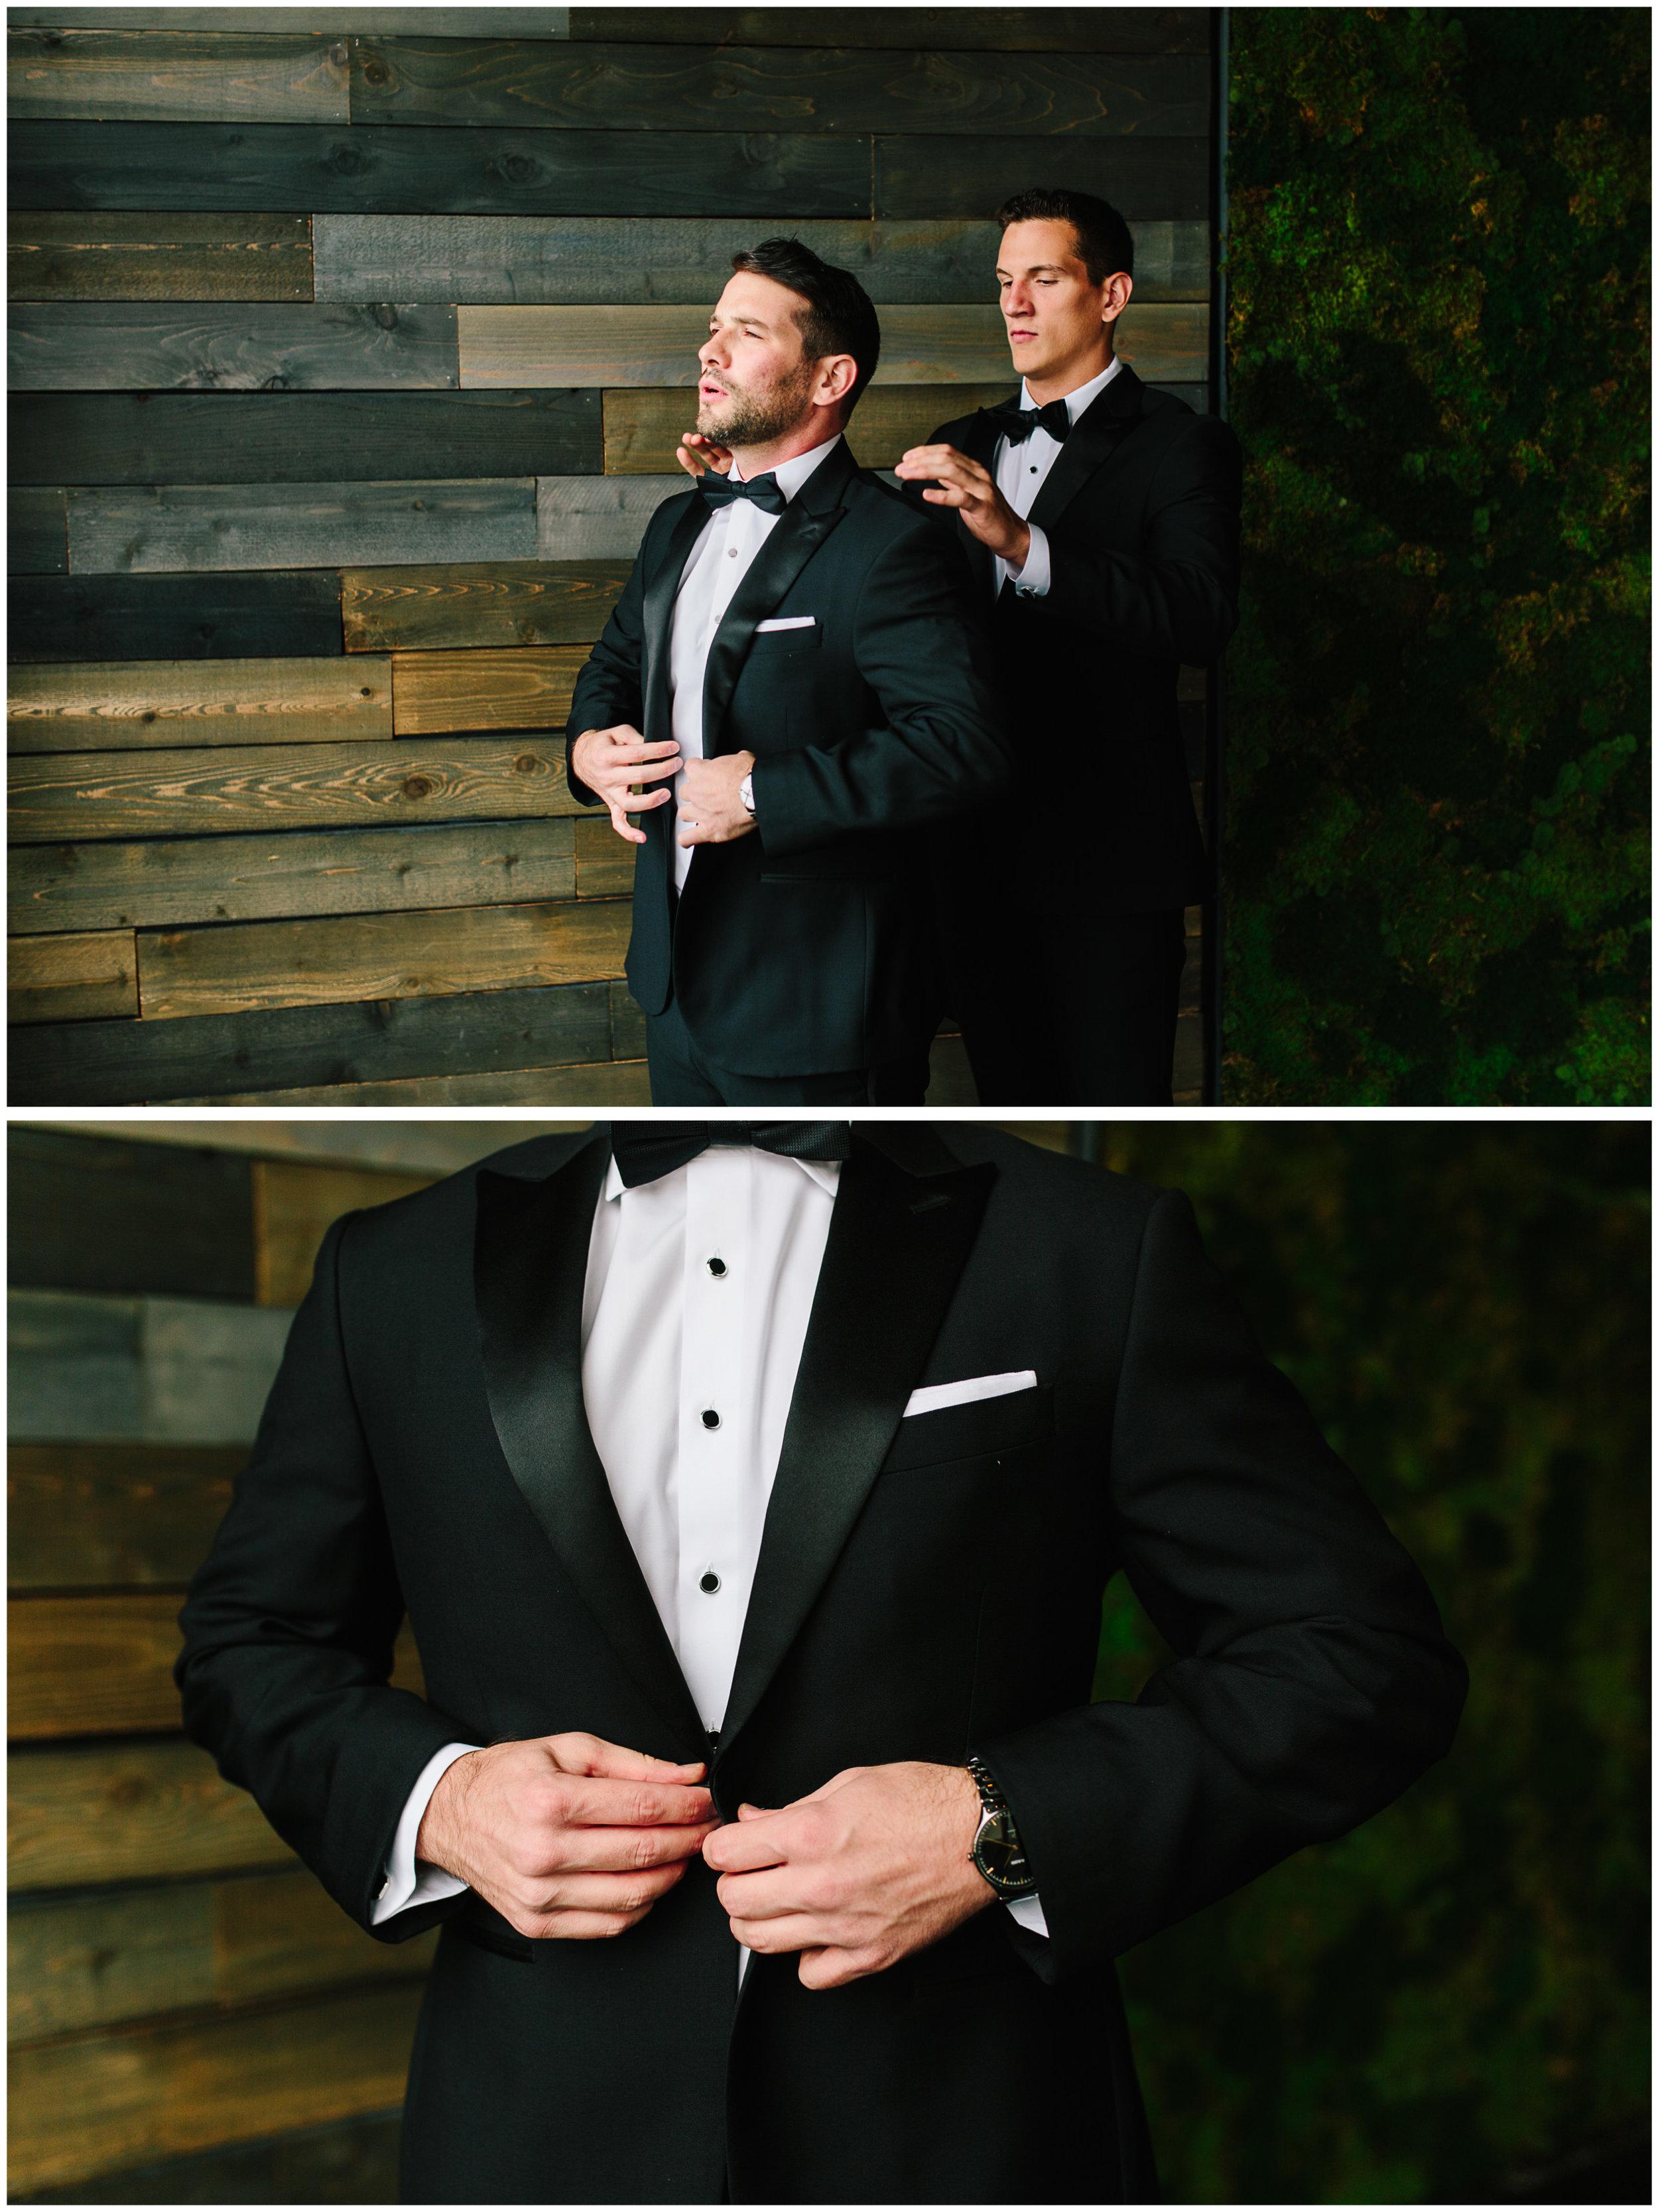 moss_denver_wedding_15.jpg